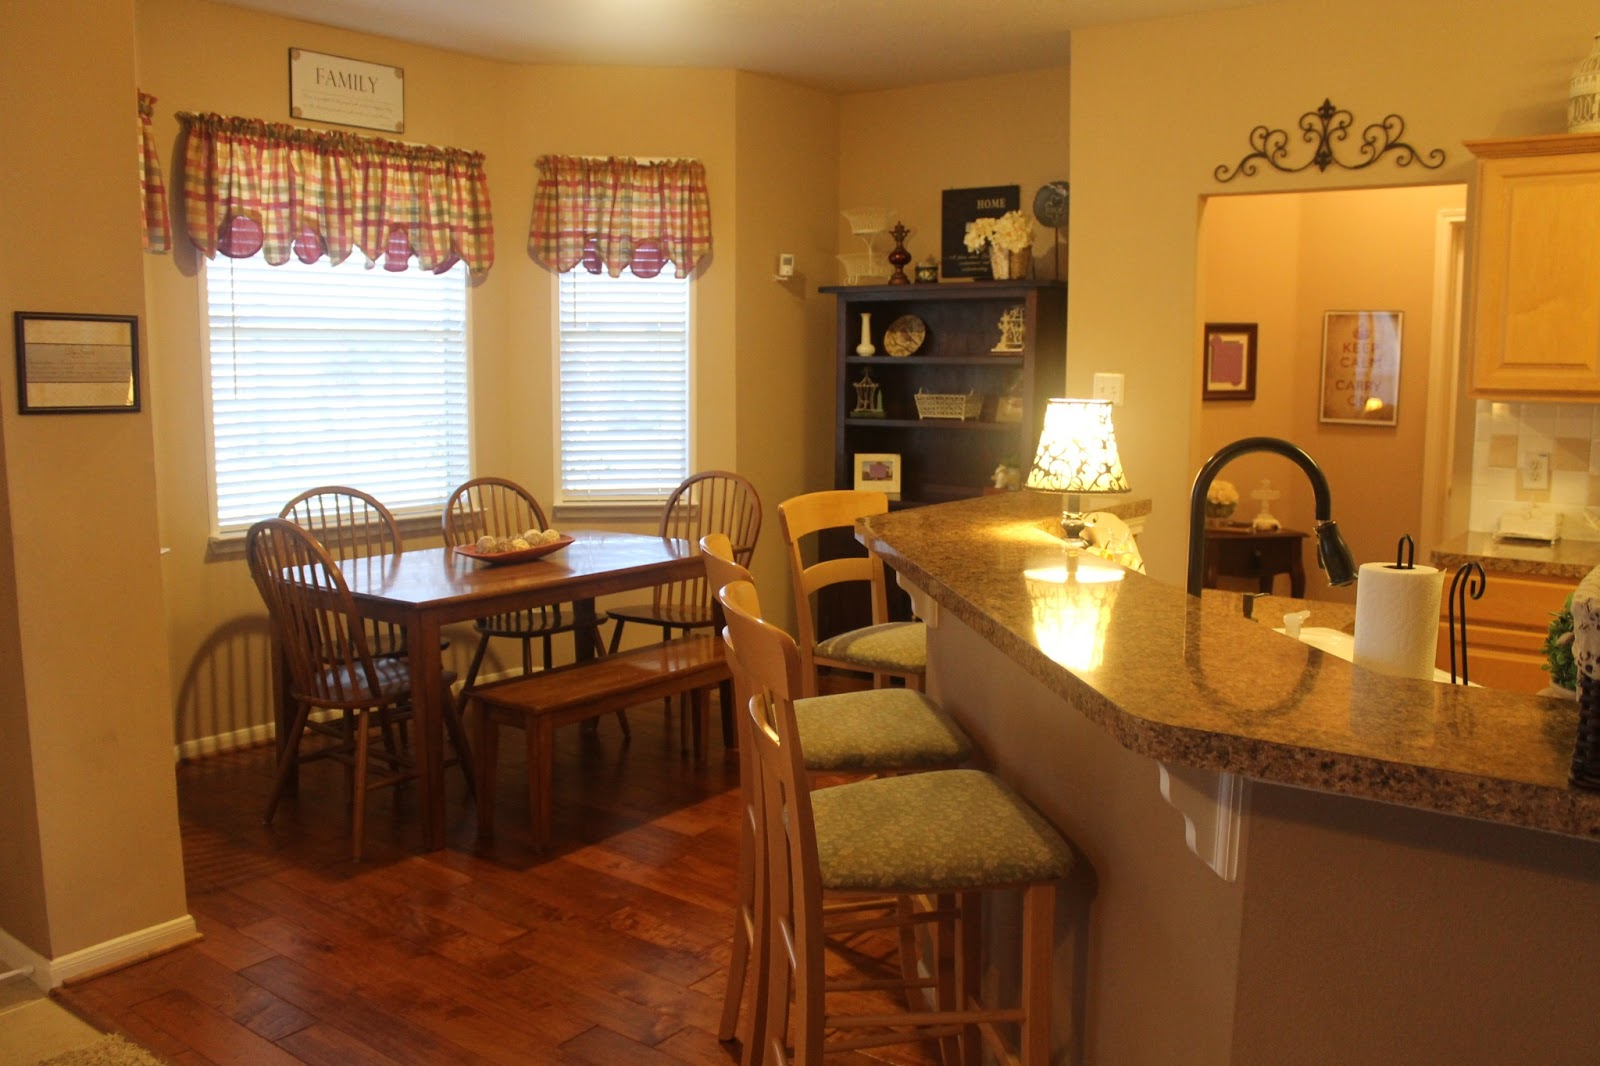 Http Texasdecor Blogspot Ca 2013 03 The Kitchen Html